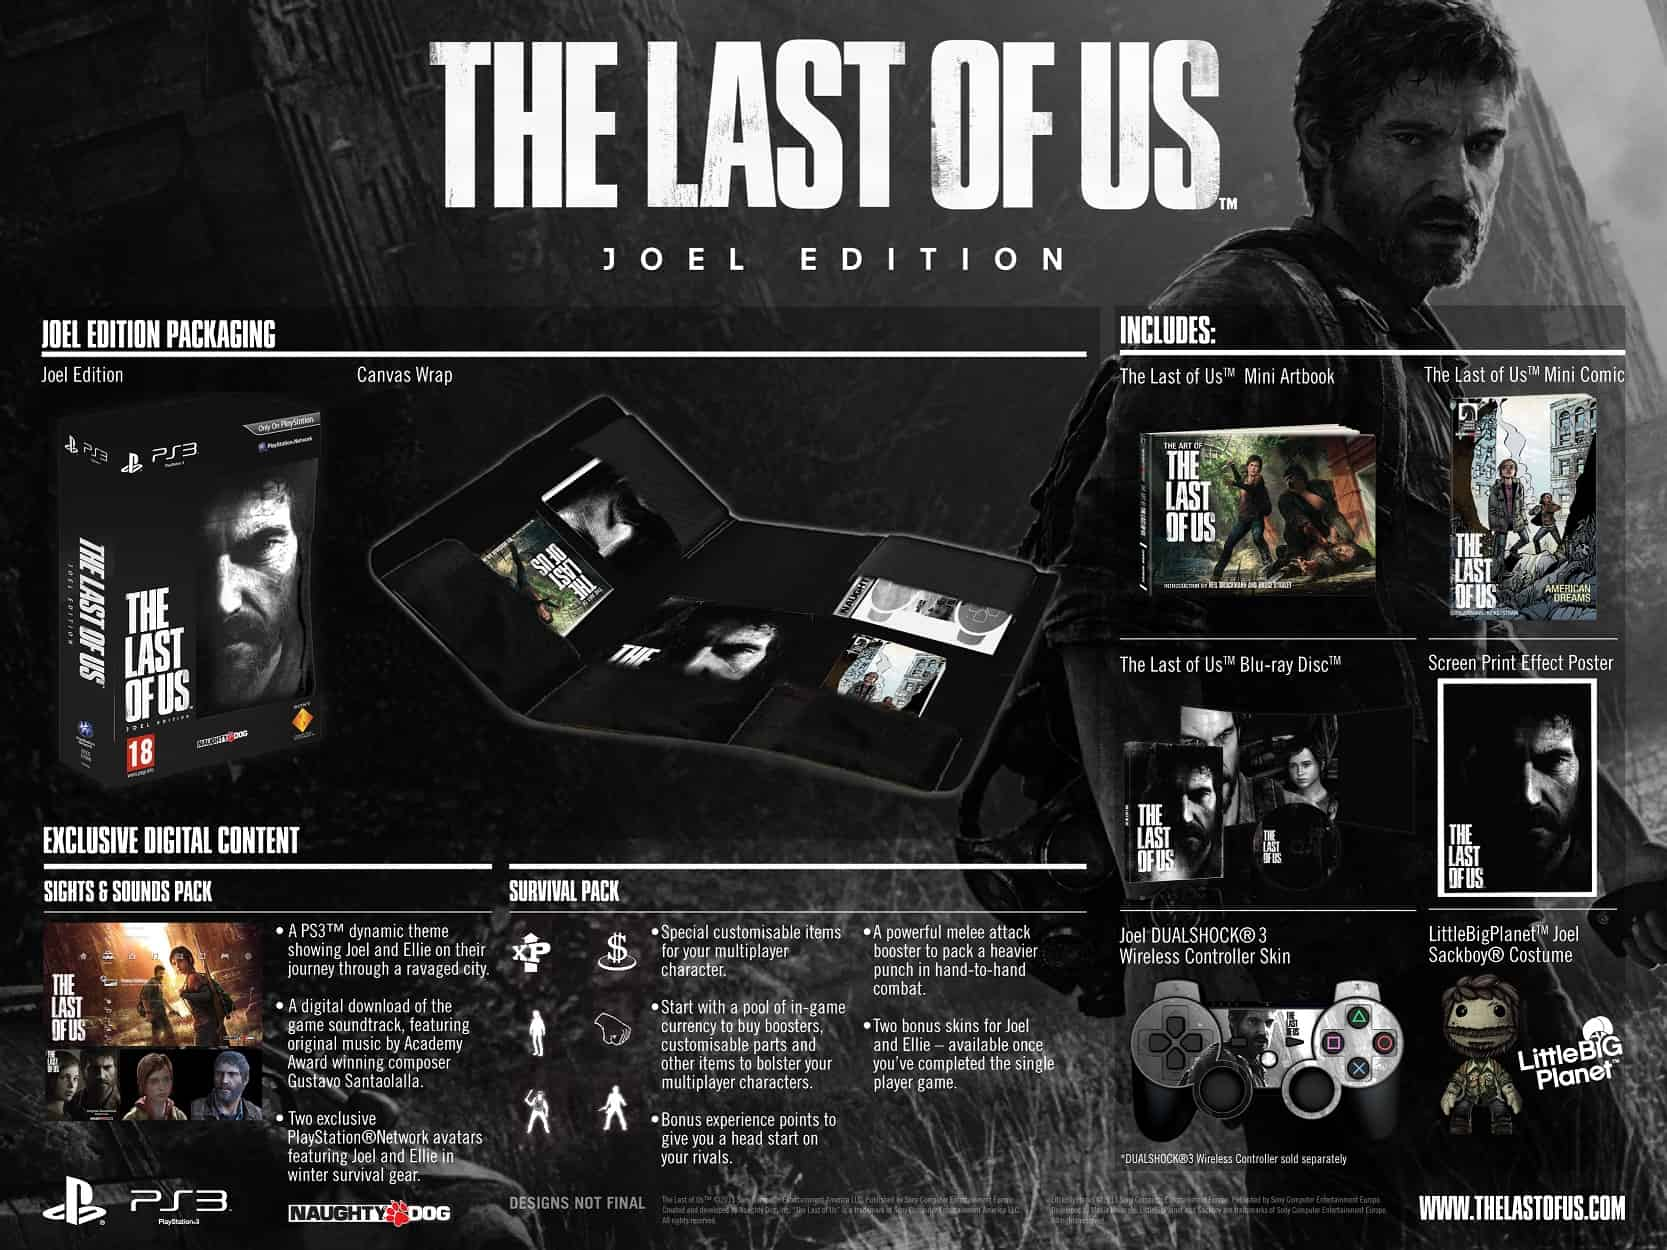 The-Last-of-Us-Joel-Edition